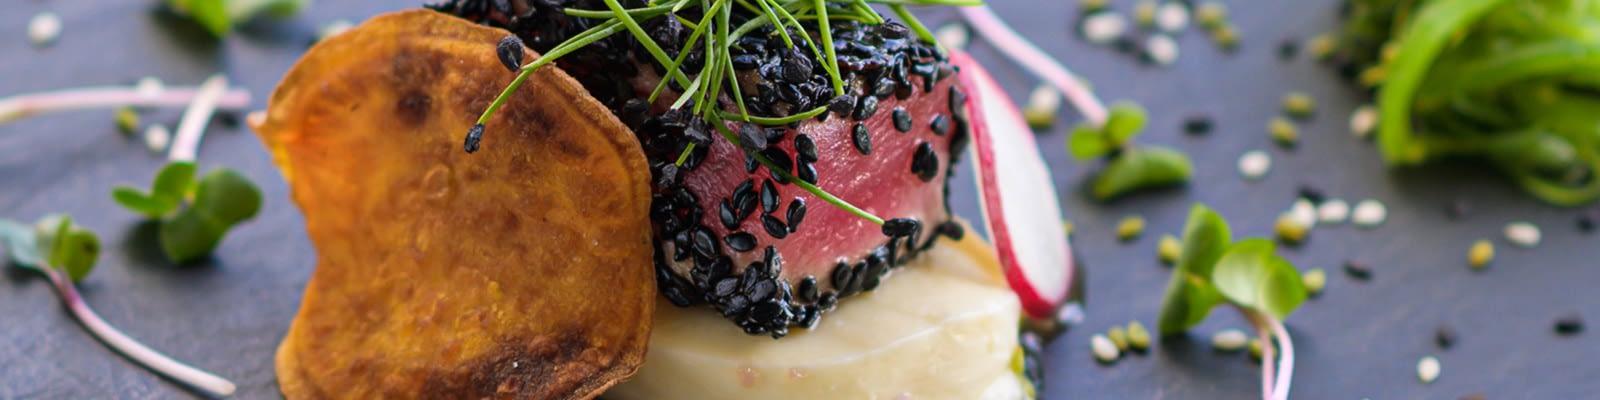 cy-by-marriott-bonaire-restaurant-slider-image-4